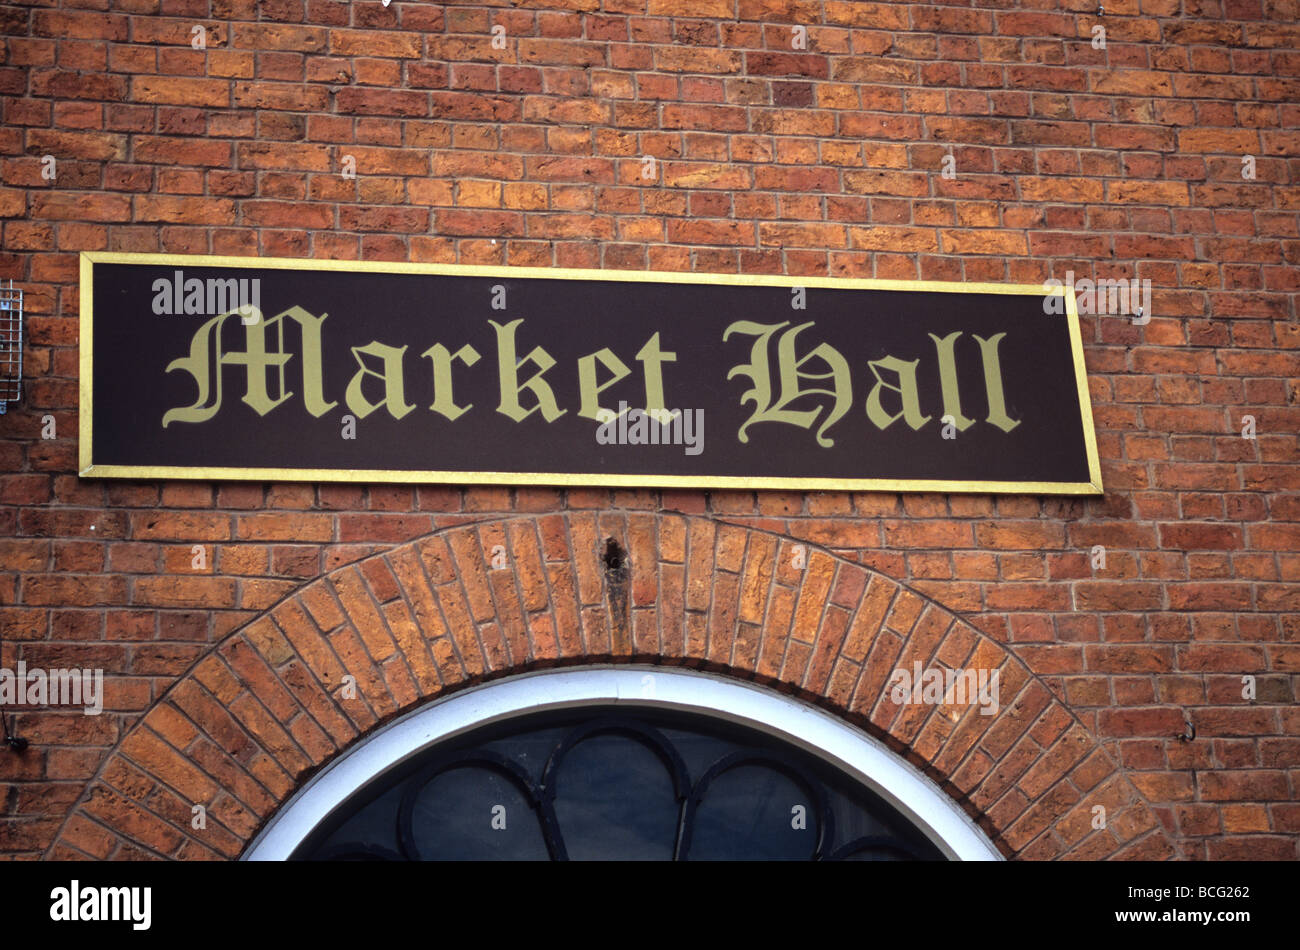 The Market Hall In Sandbach, Cheshire - Stock Image